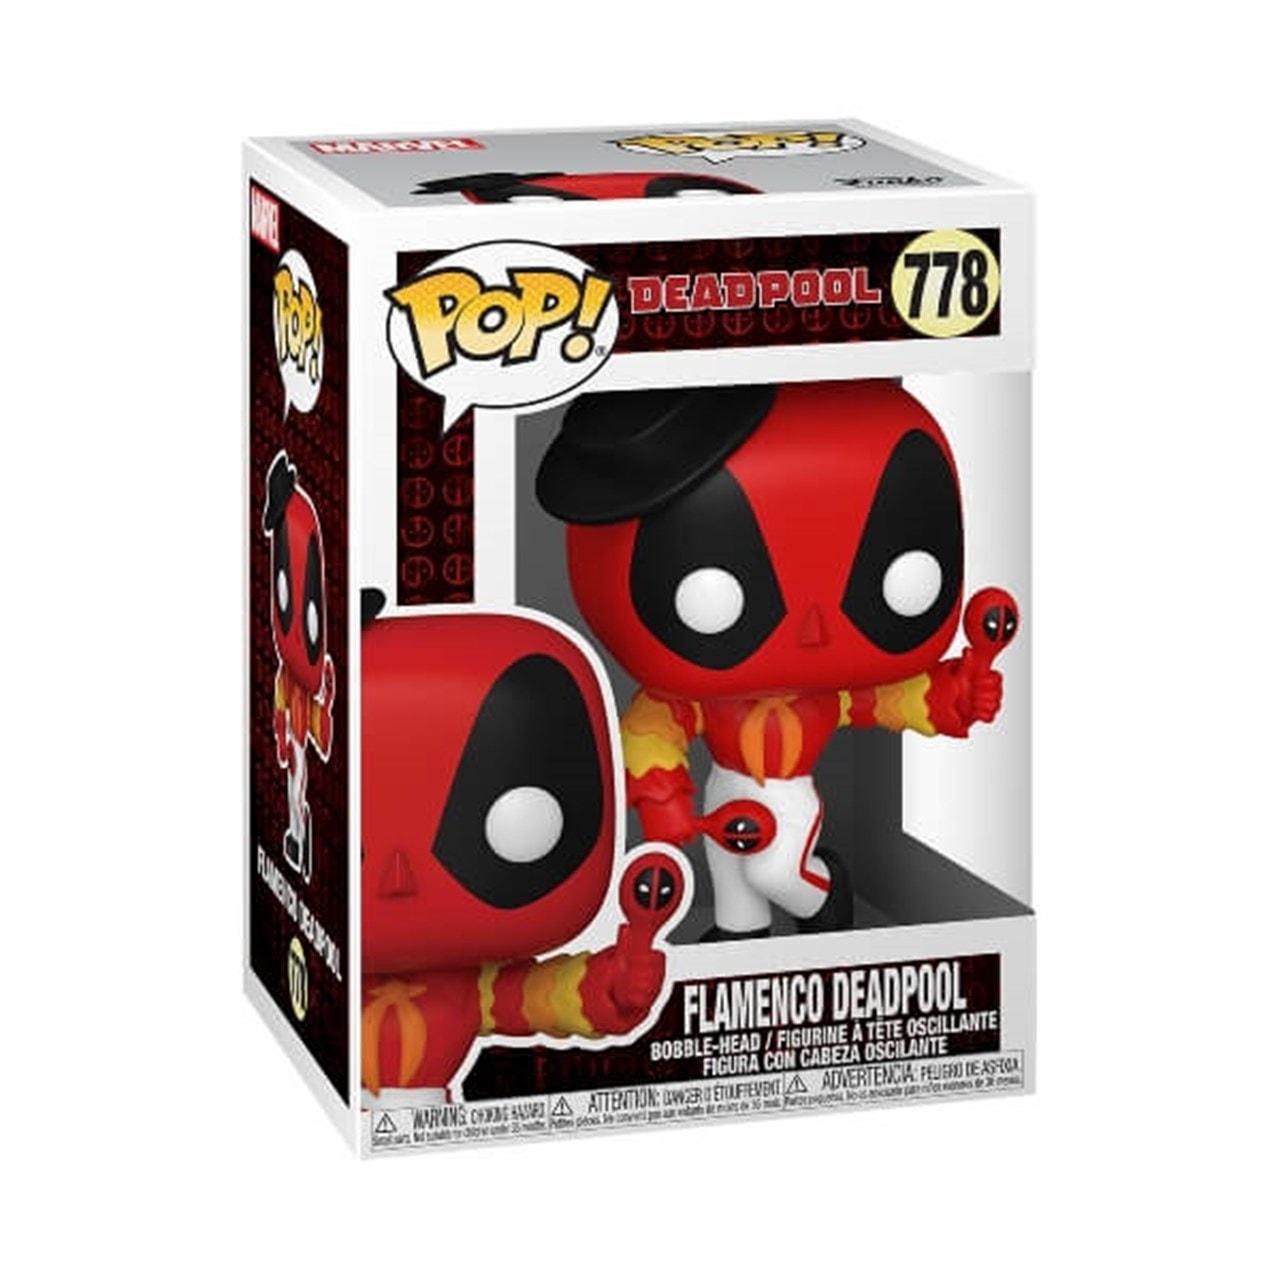 Flamenco Deadpool (778) Deadpool 30th Marvel Pop Vinyl - 2